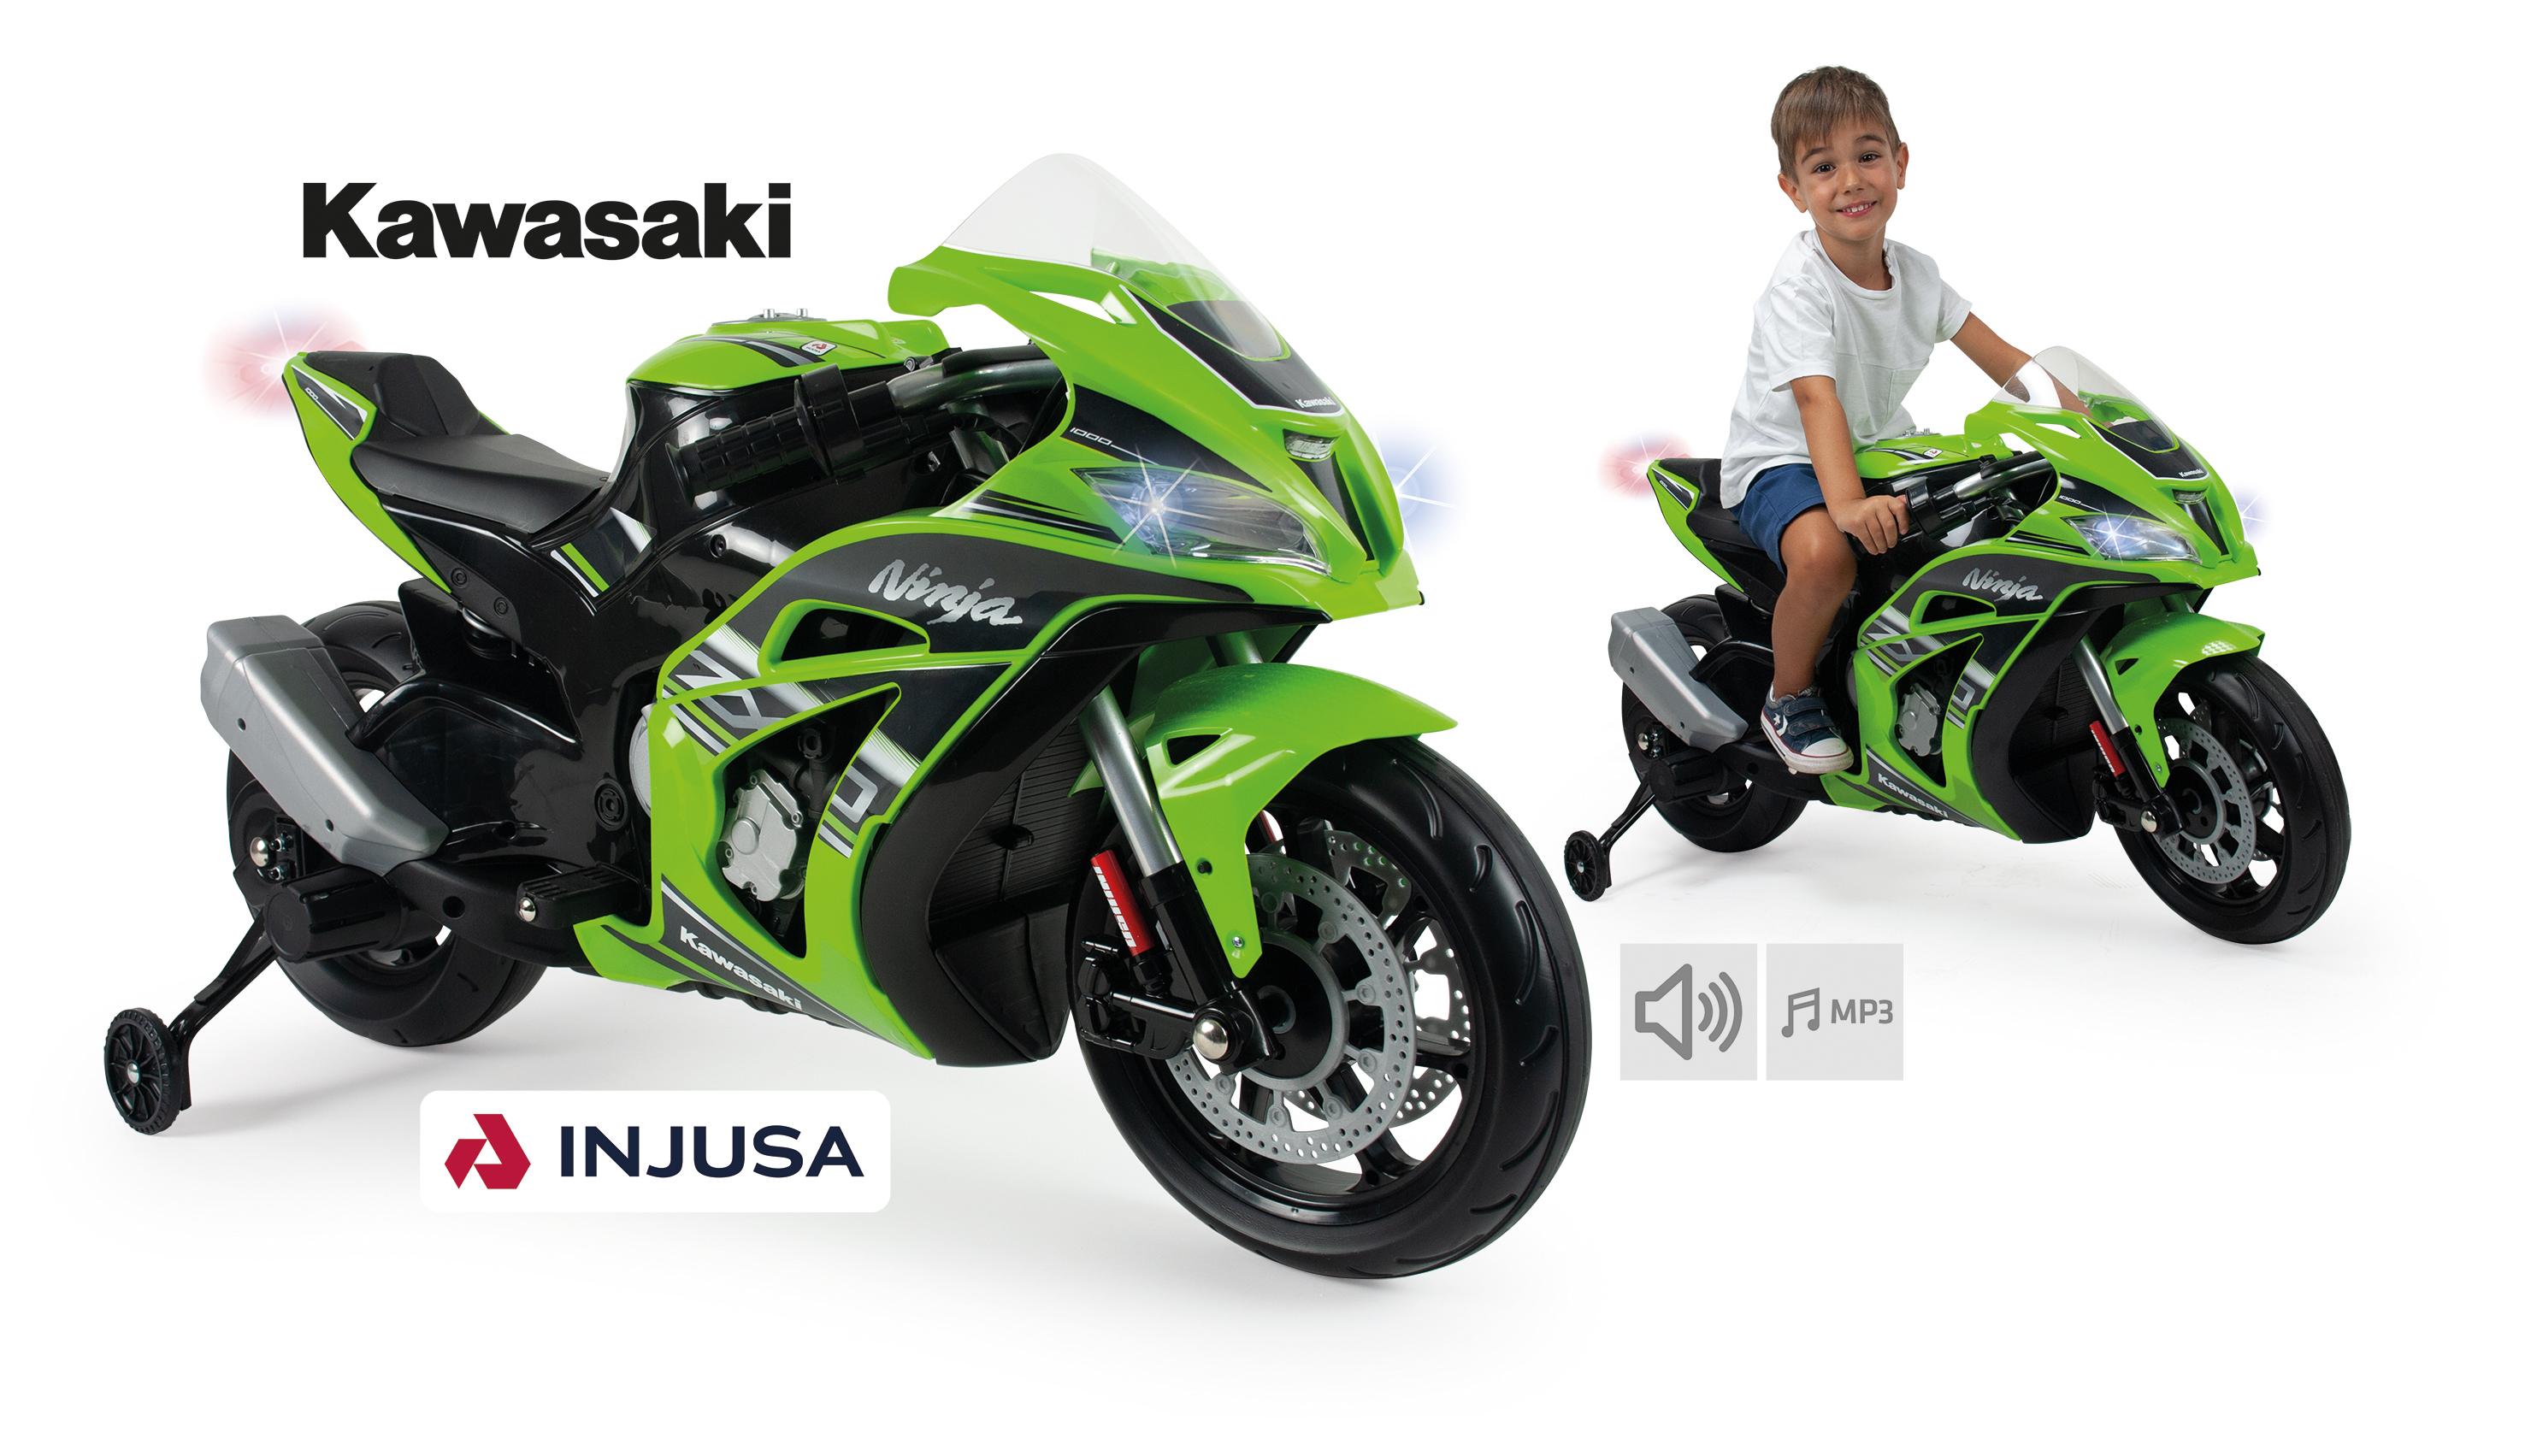 MOTO KAWASAKI ZX10 12V LUCES Y SONIDO 6495 - N59820